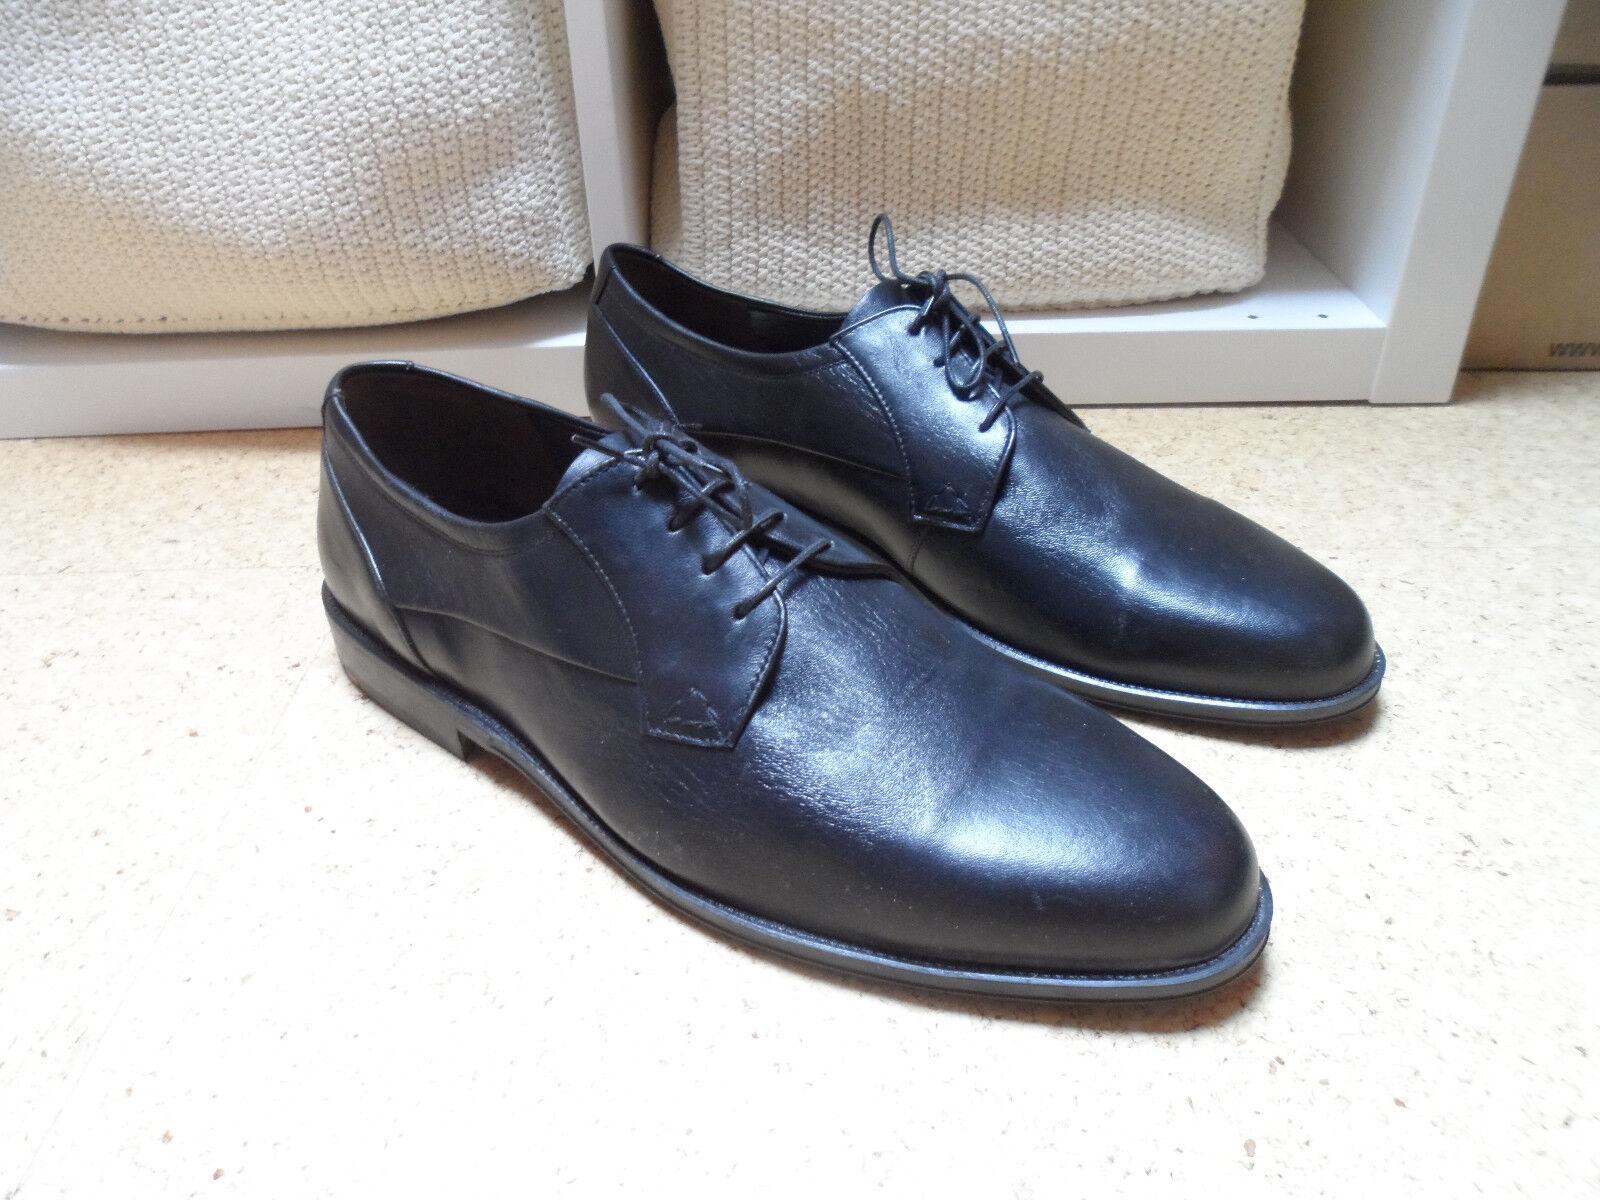 Lloyd Herren Echtleder Schuhe Gr.47 schwarz Businessschuhe Neu